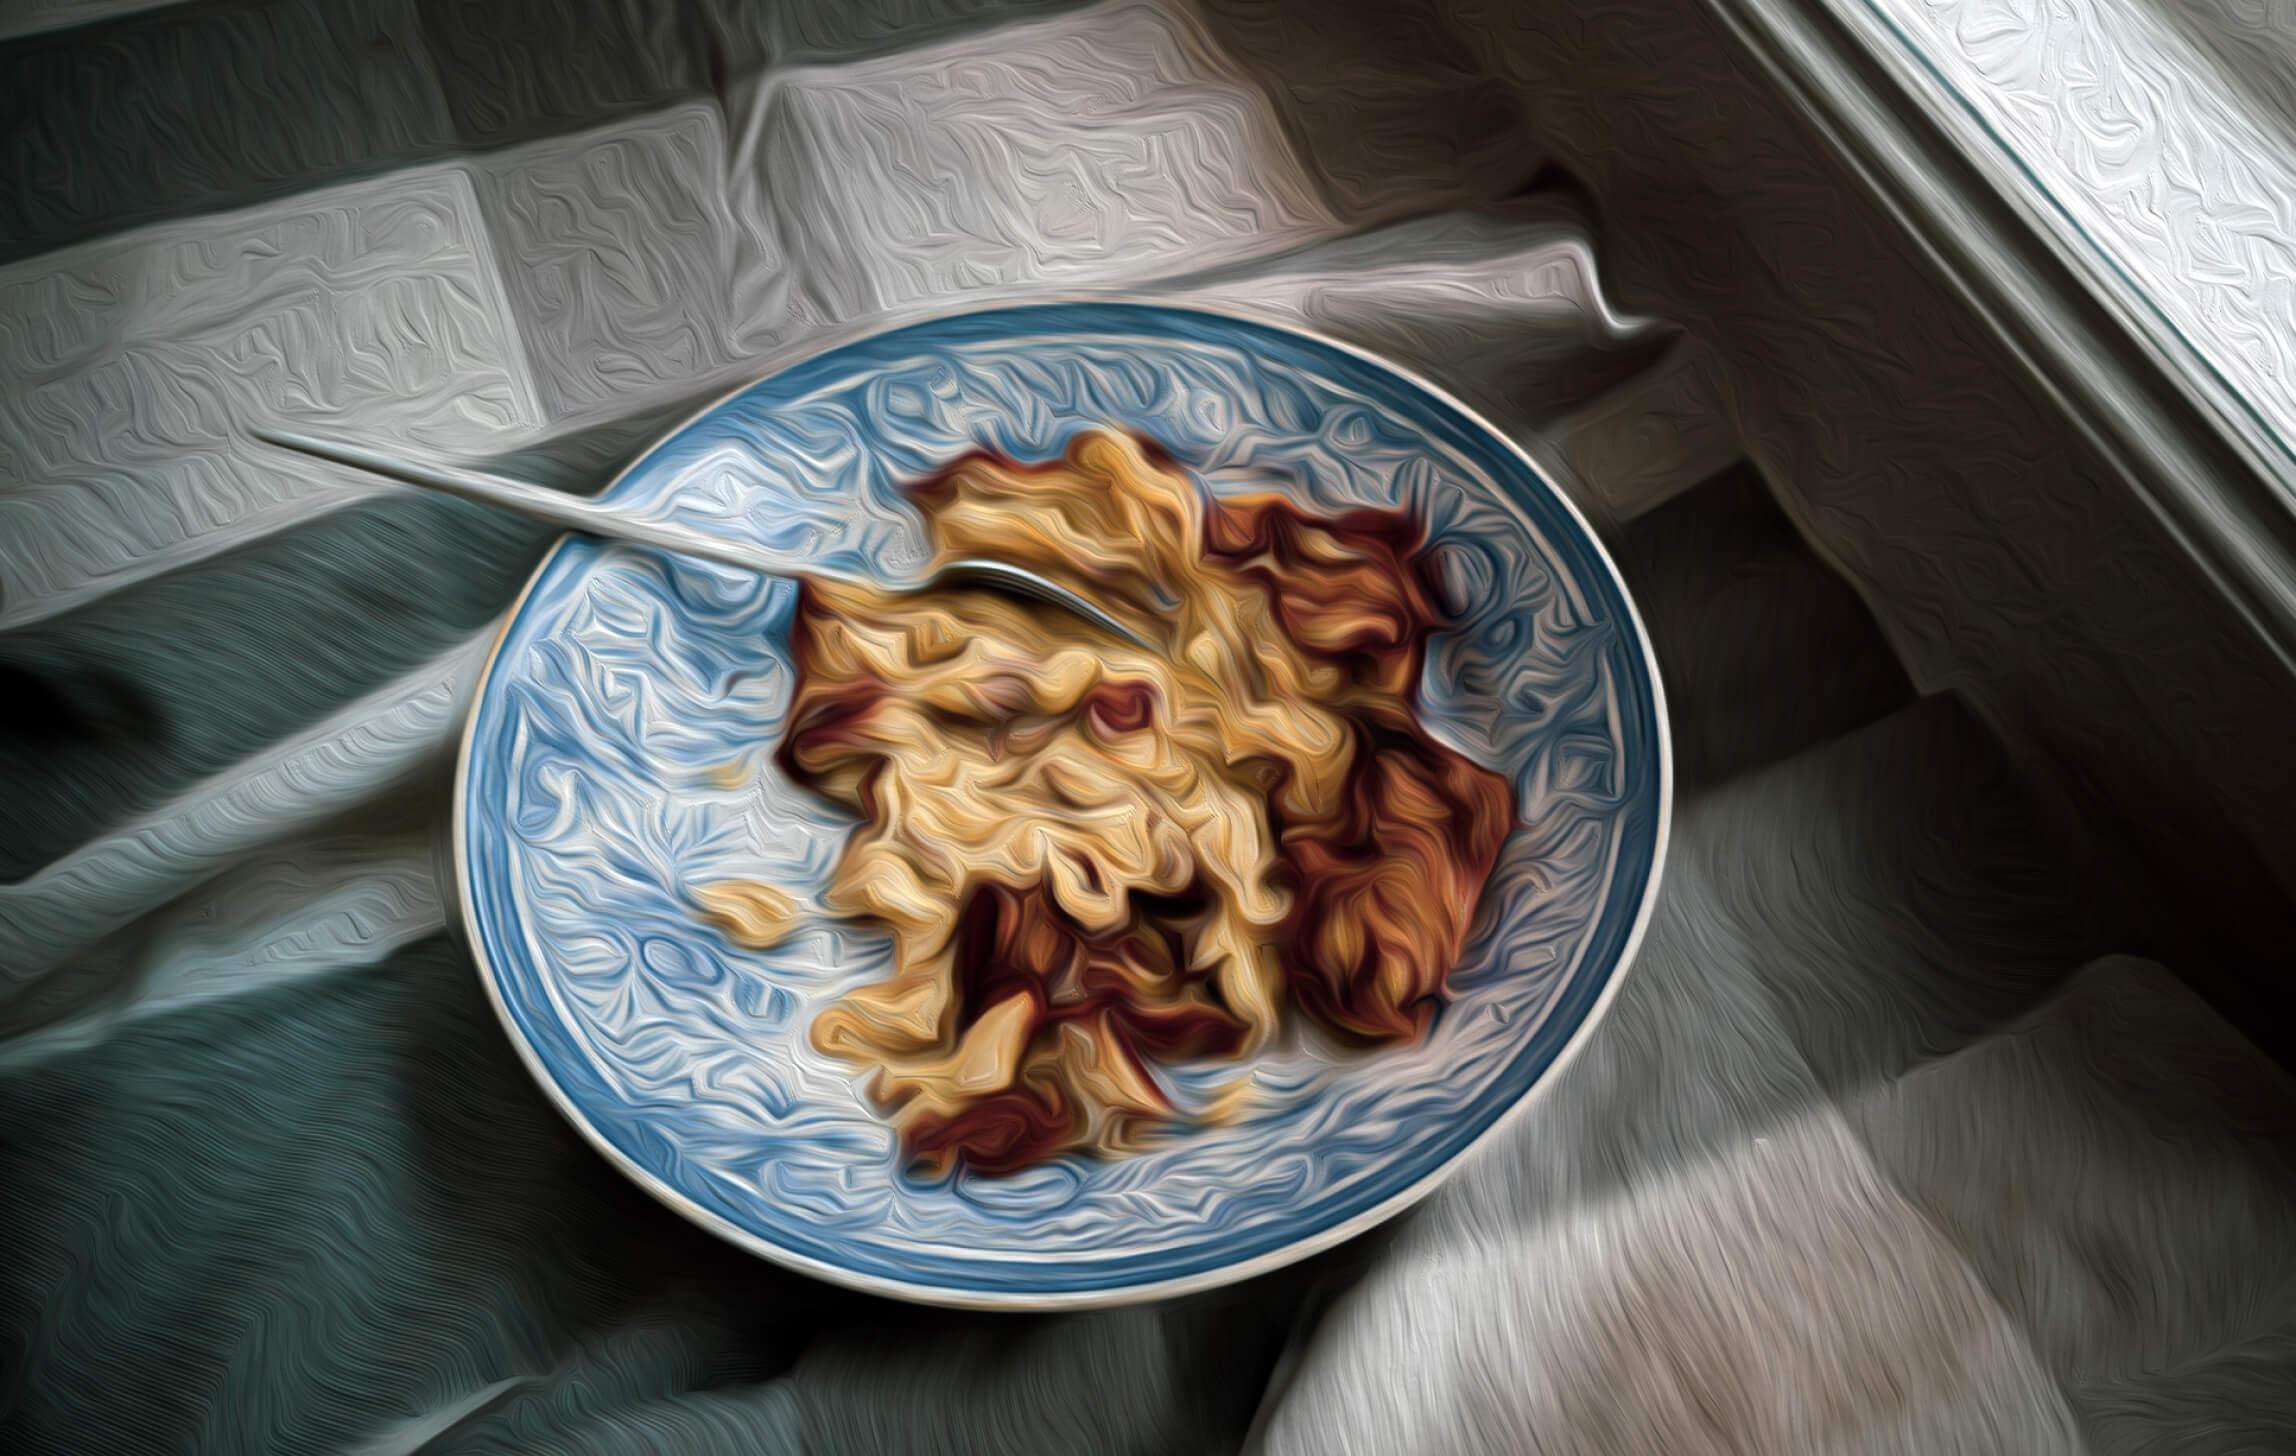 Macaroni Casserole by Kim Mikkola